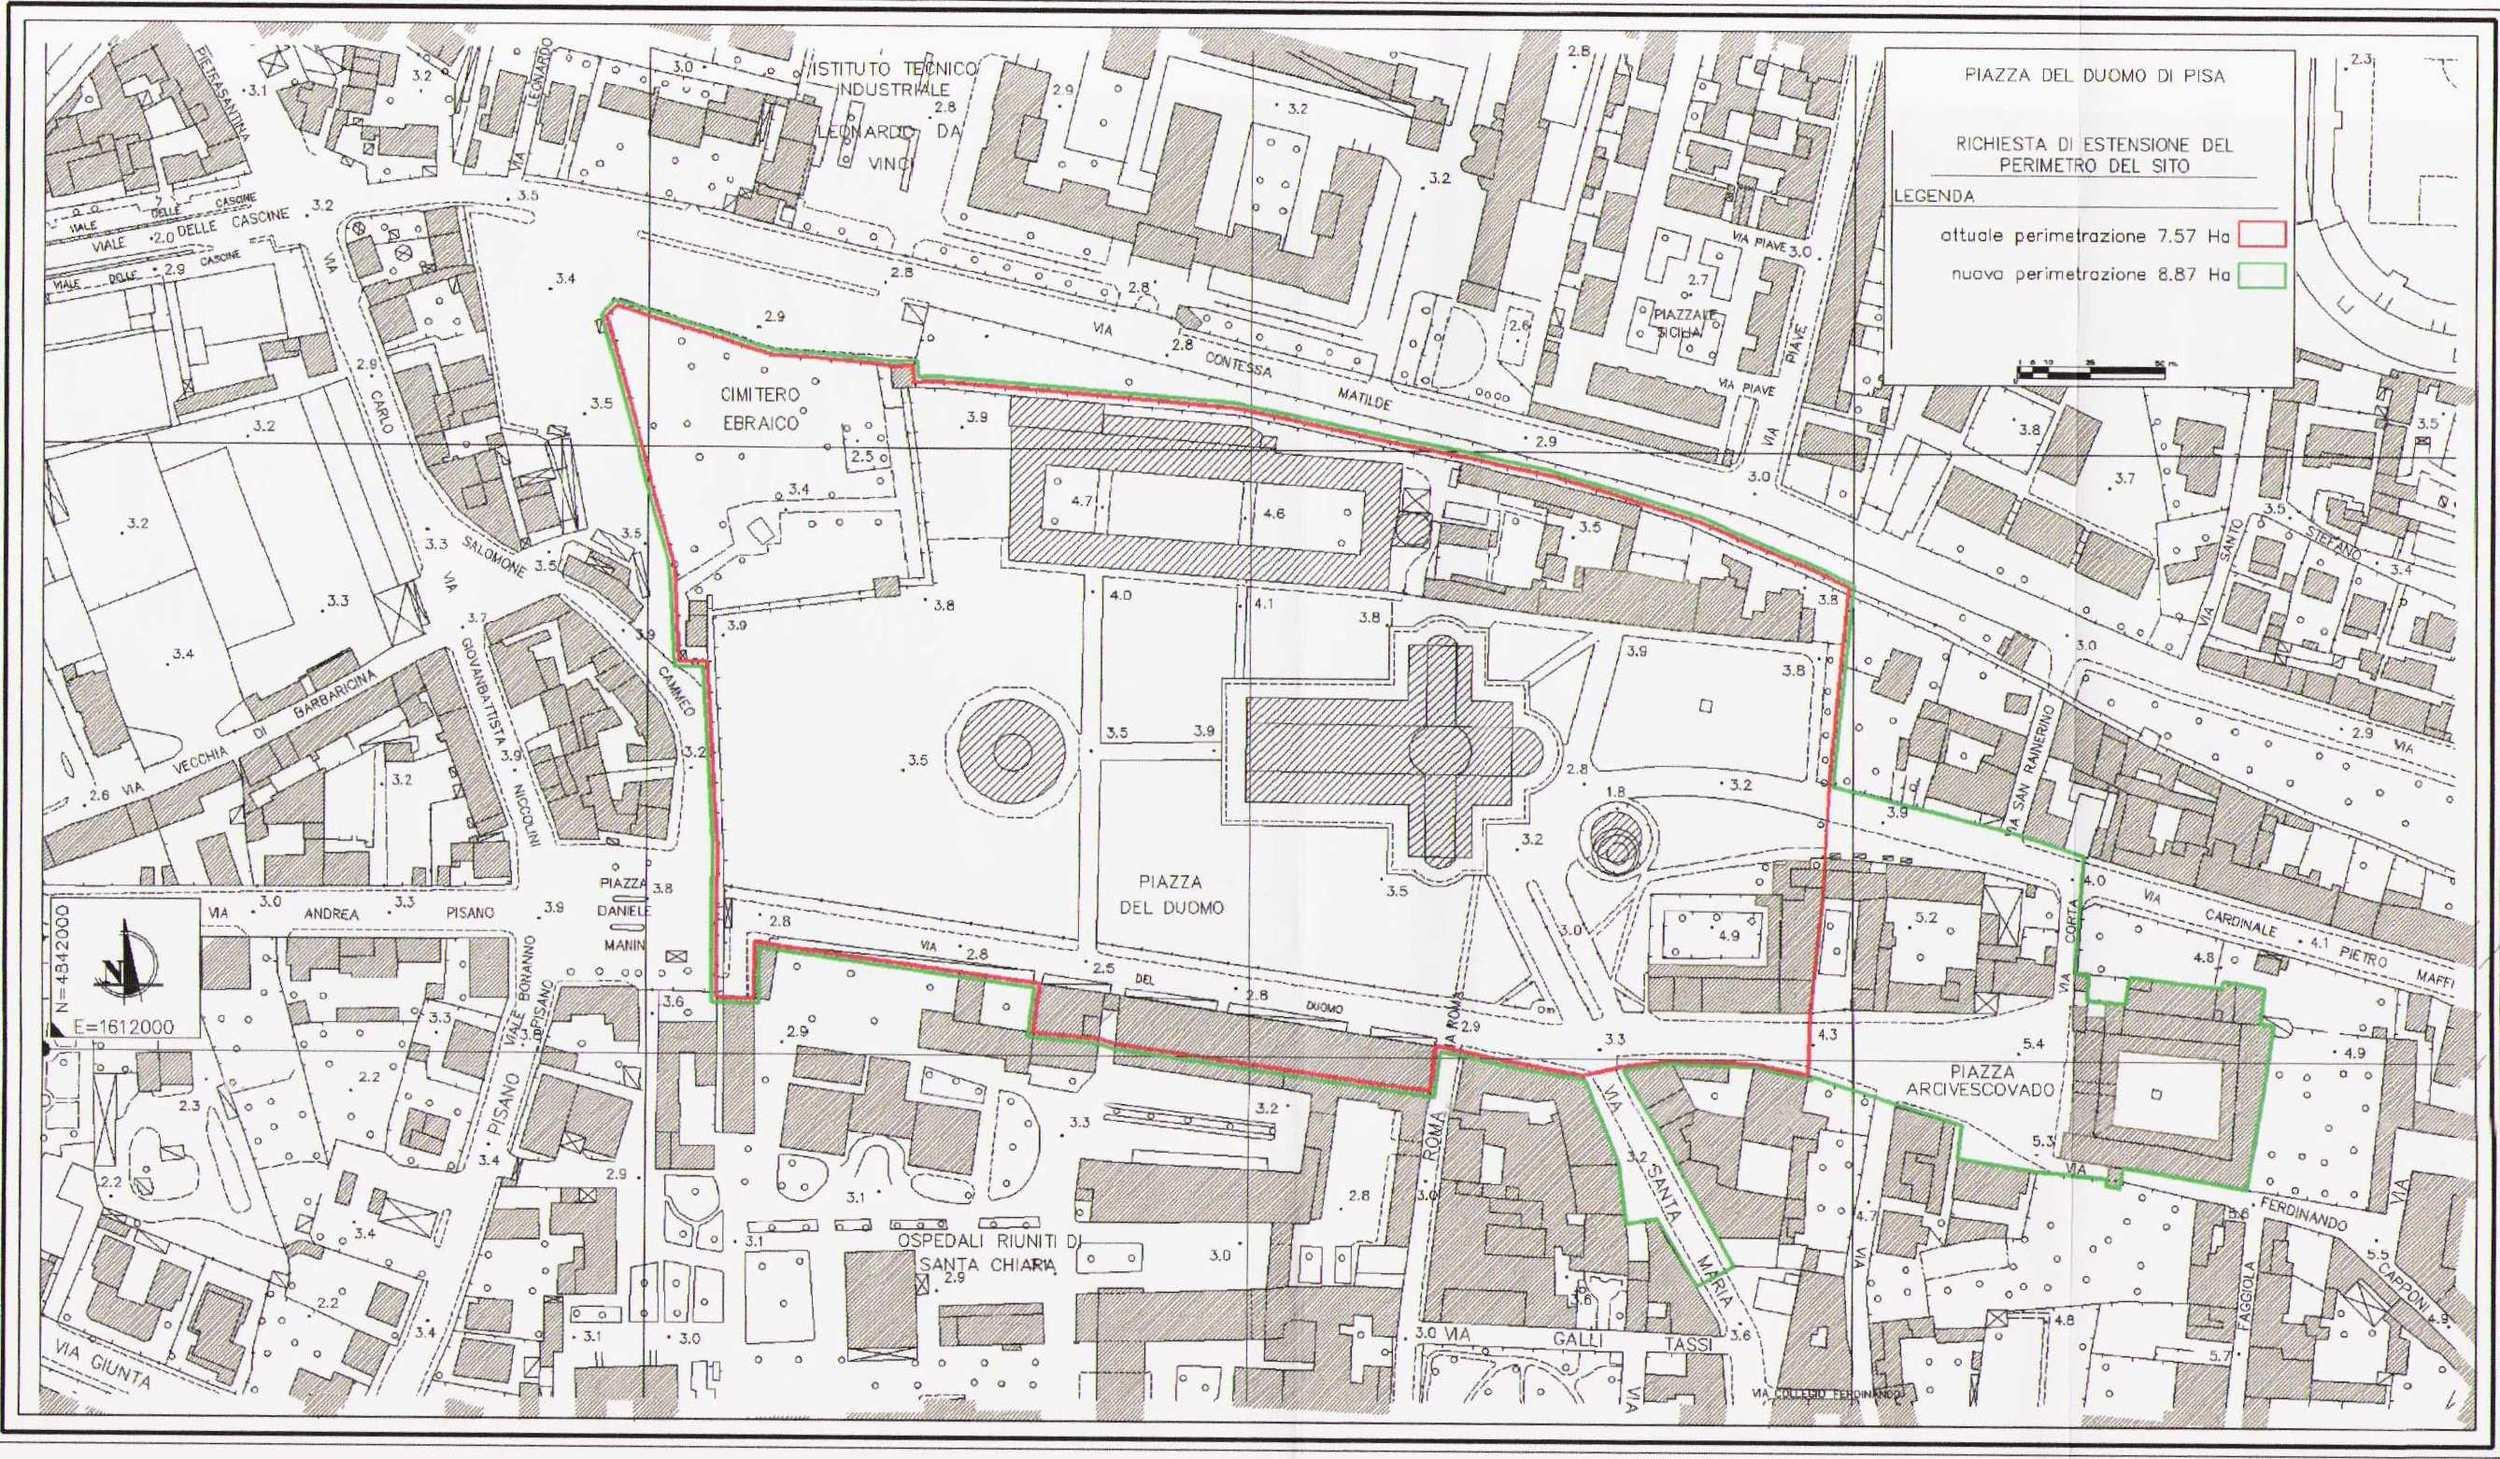 Piazza del Duomo, Pisa, Italy. UNESCO World Heritage site #395. Inscribed 30 December 1986. (UNESCO 1986)